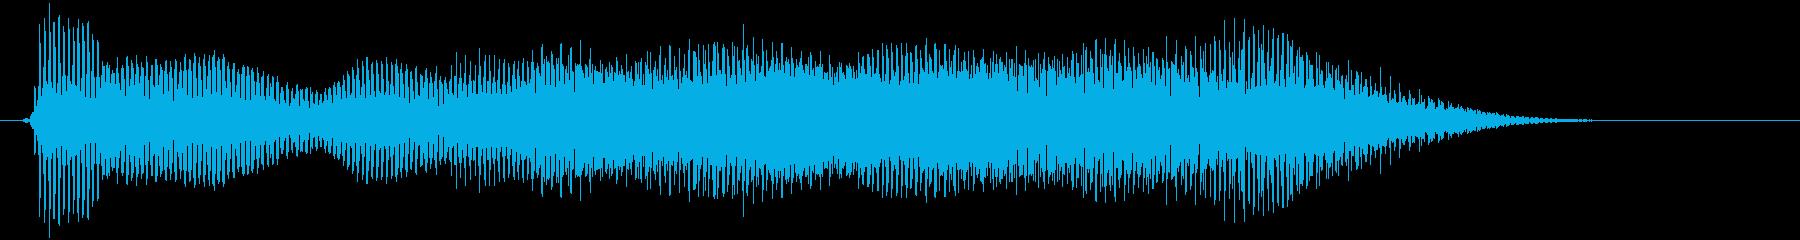 SCI-FI AI Evil Hu...の再生済みの波形